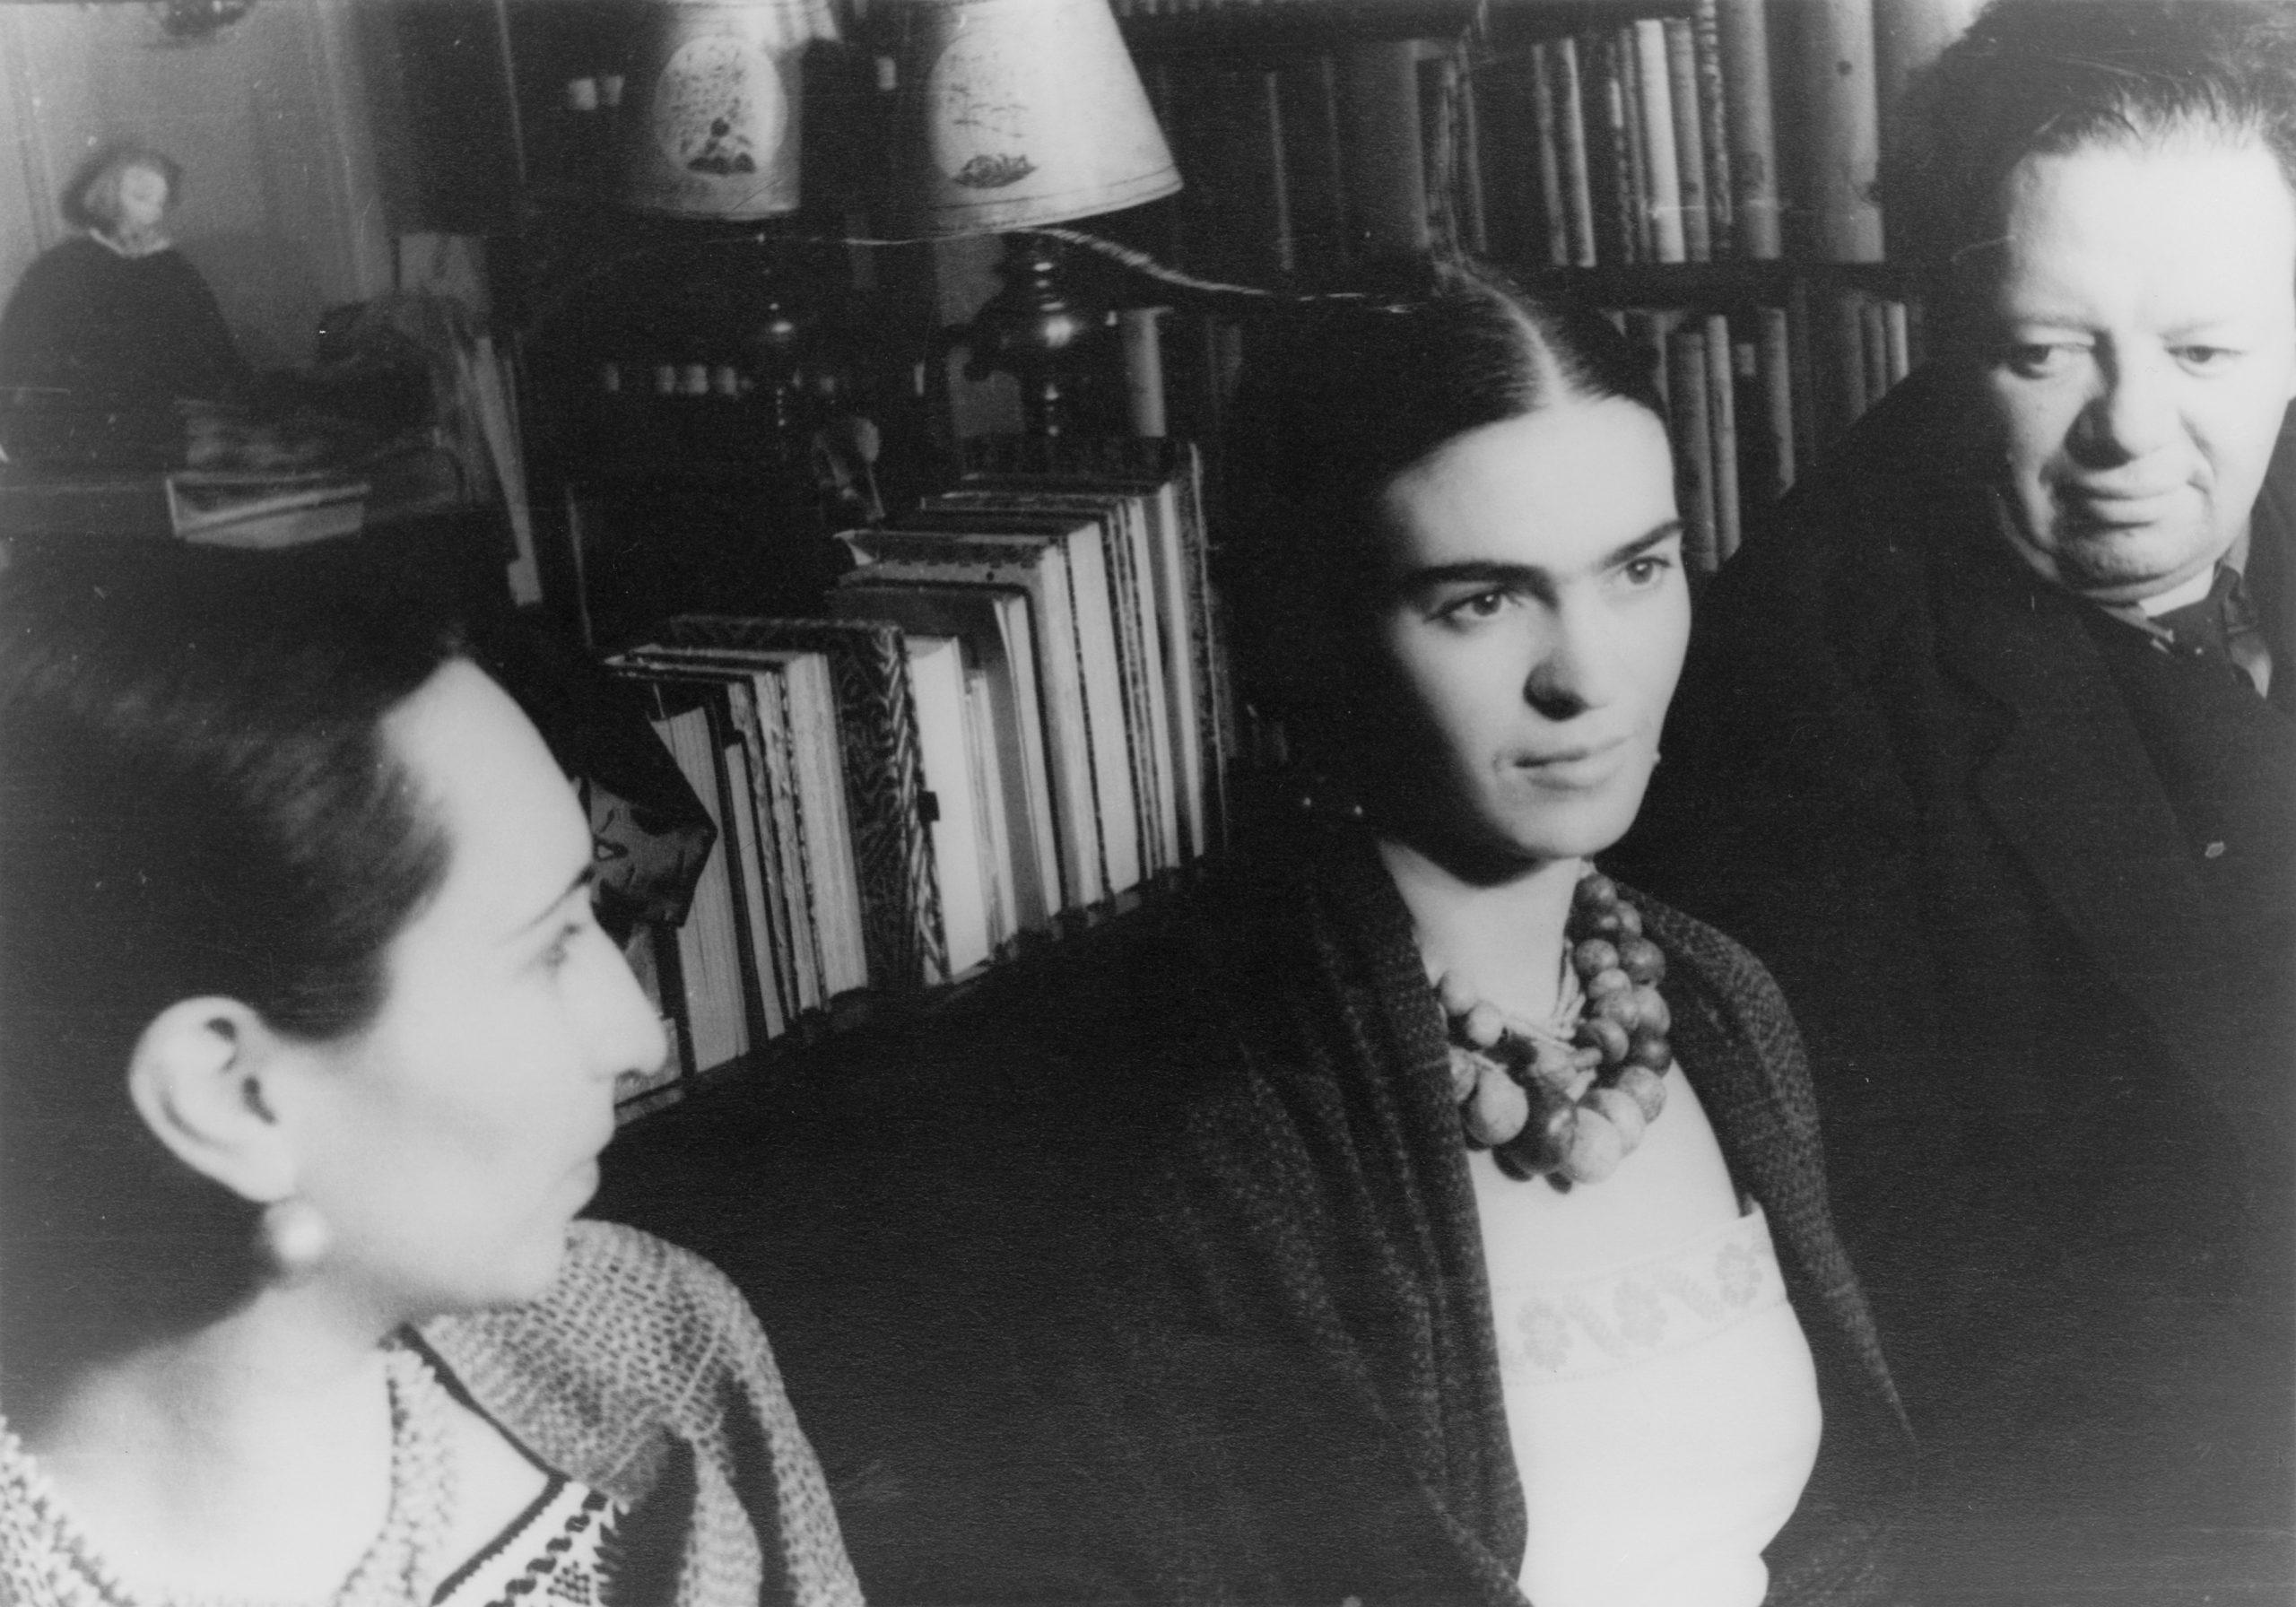 Frida Kahlo: Between art and revolution